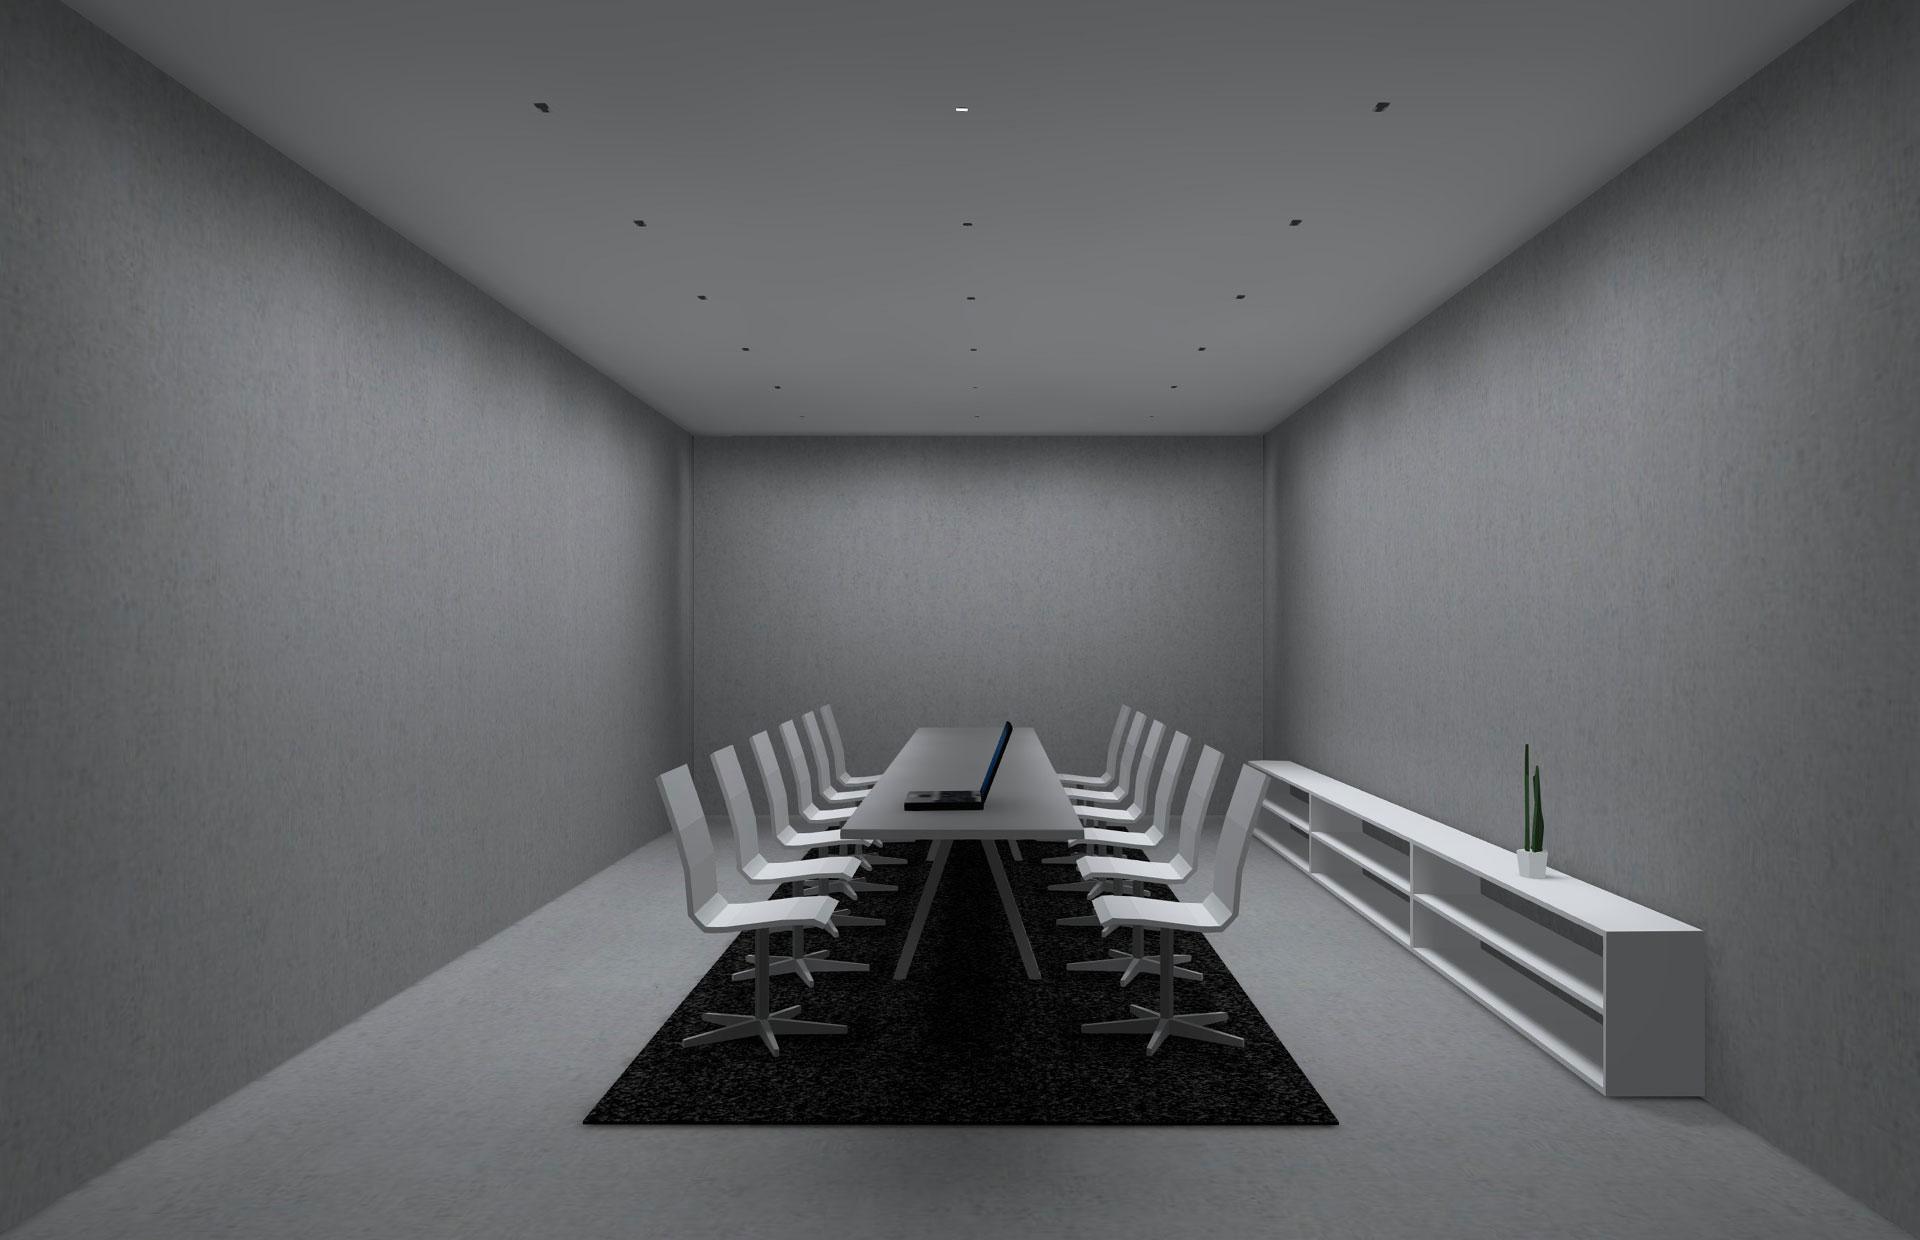 01wallwasherscorridorlarge1920x1240 1521016426 2